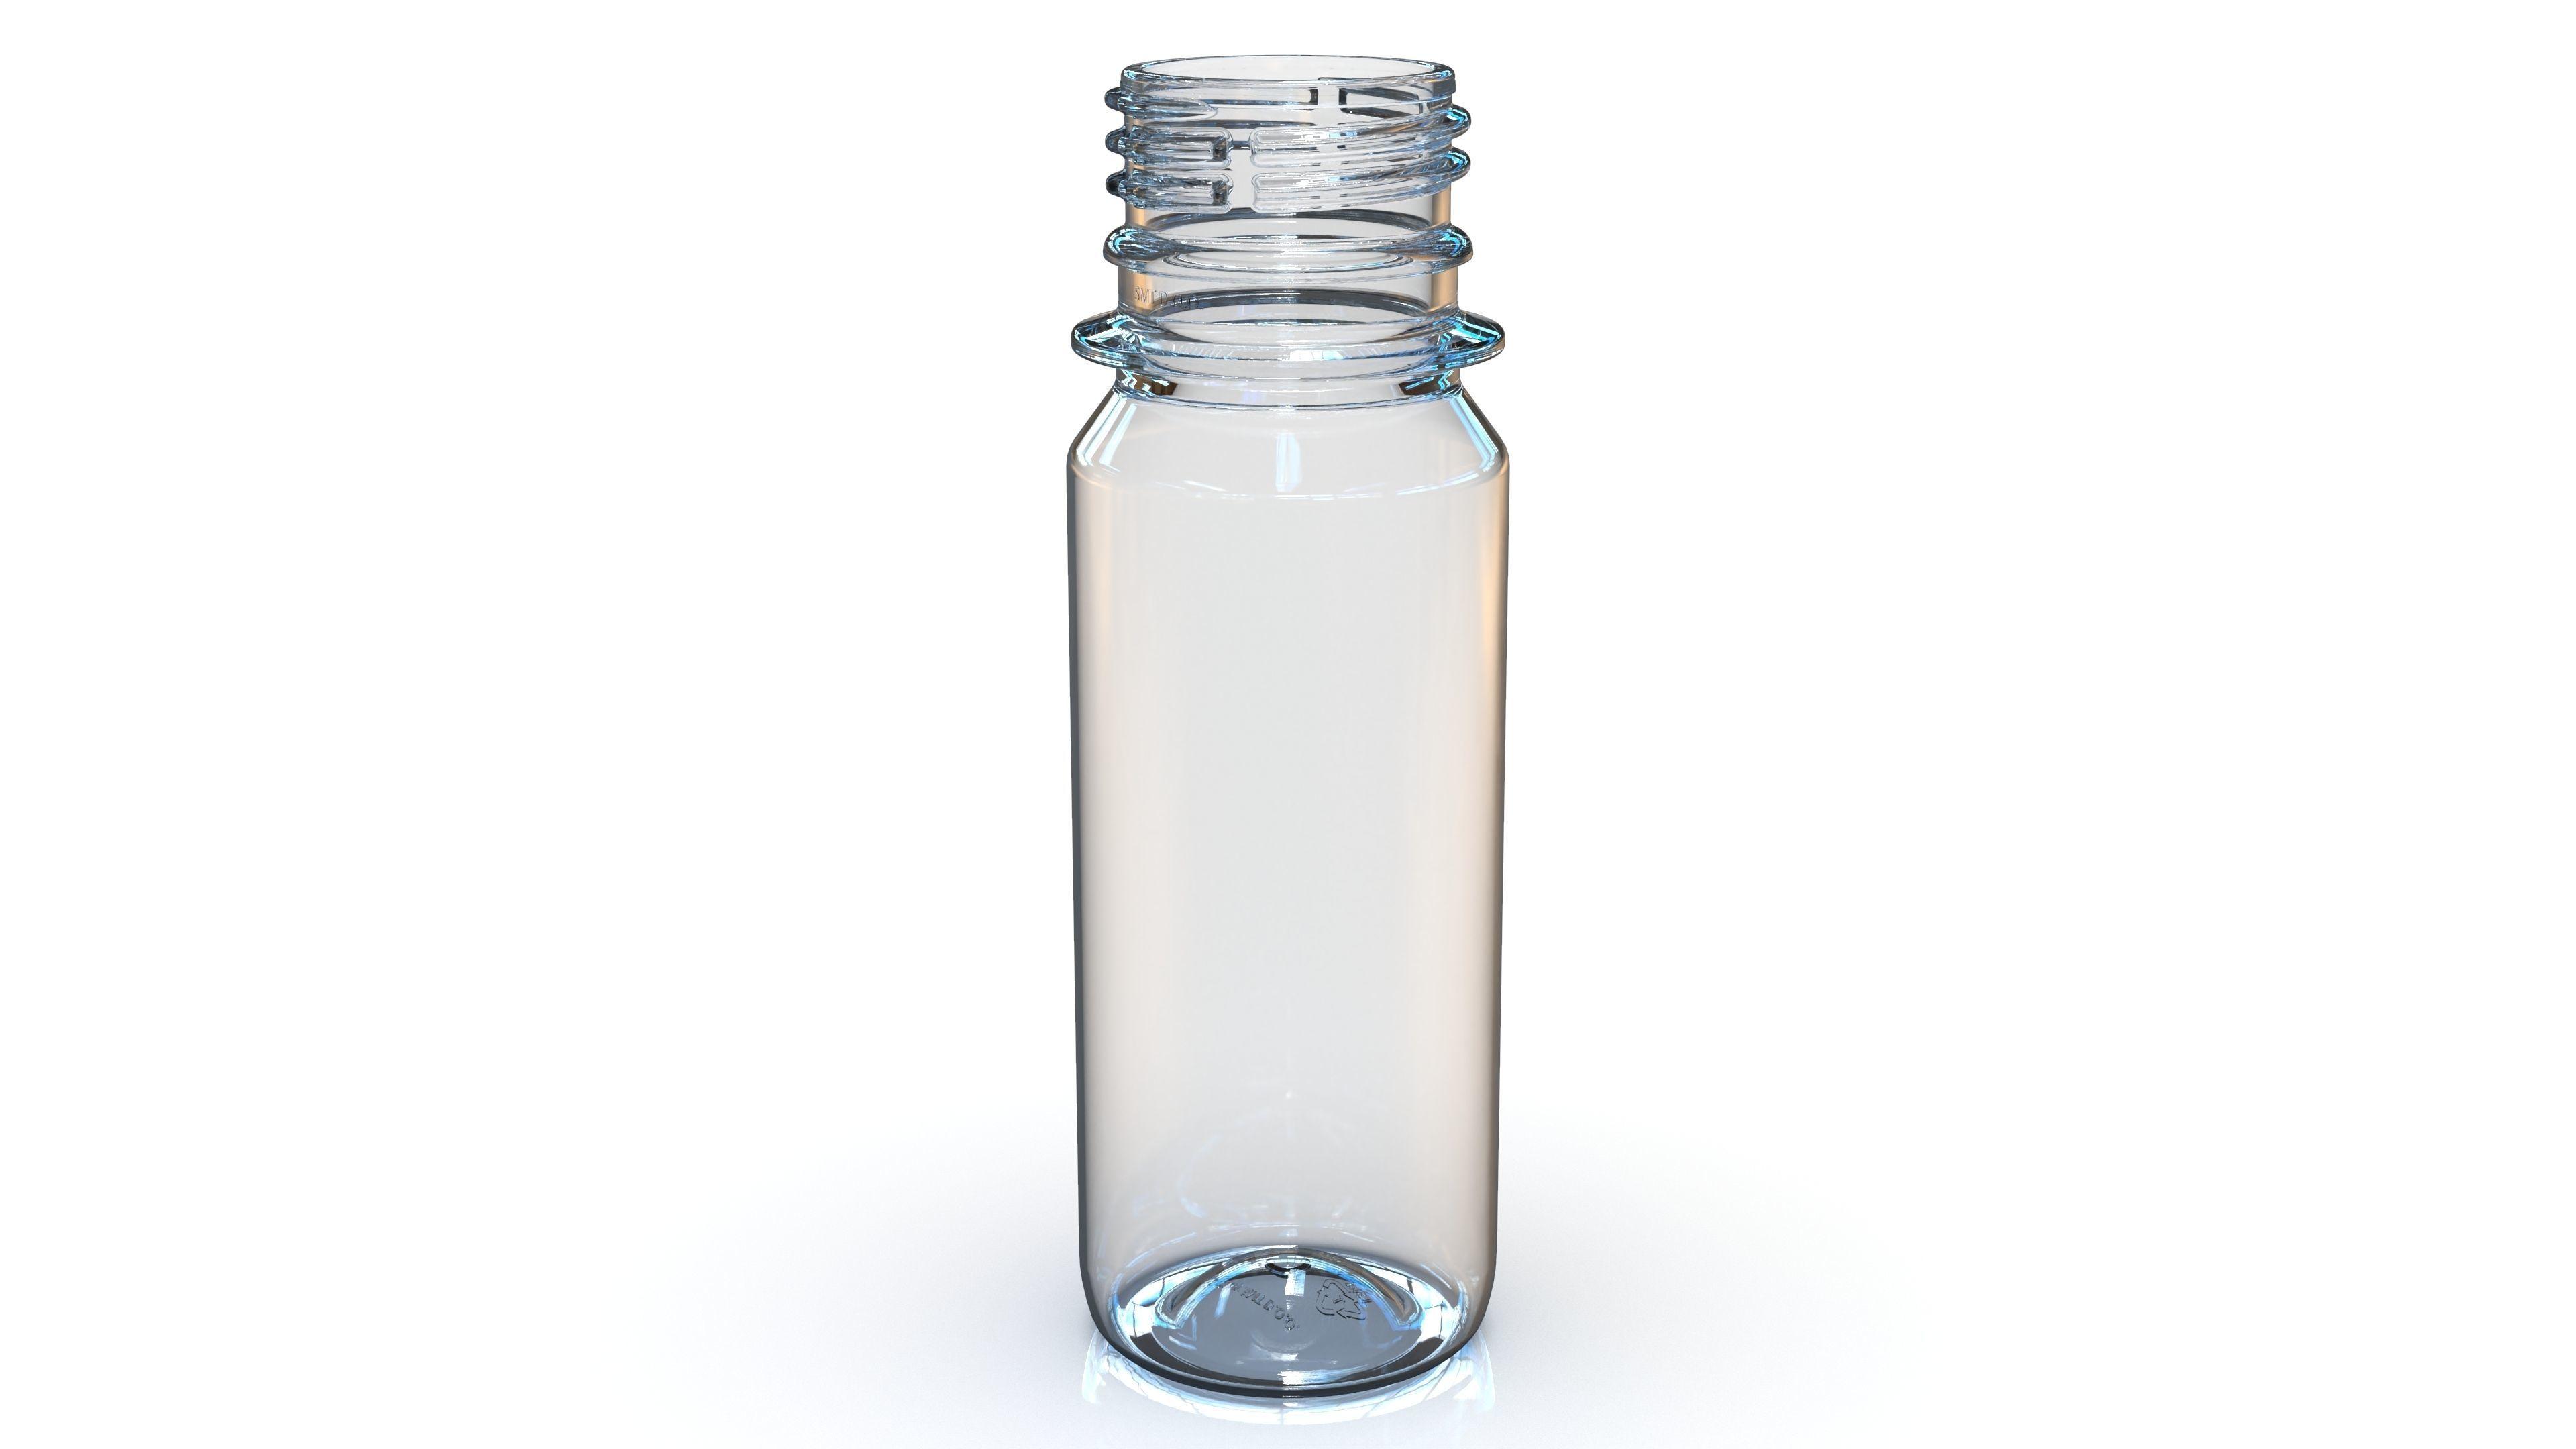 PET Bottle PCO - 1810 - 28 mm 60 mL - for water - drinks - etc